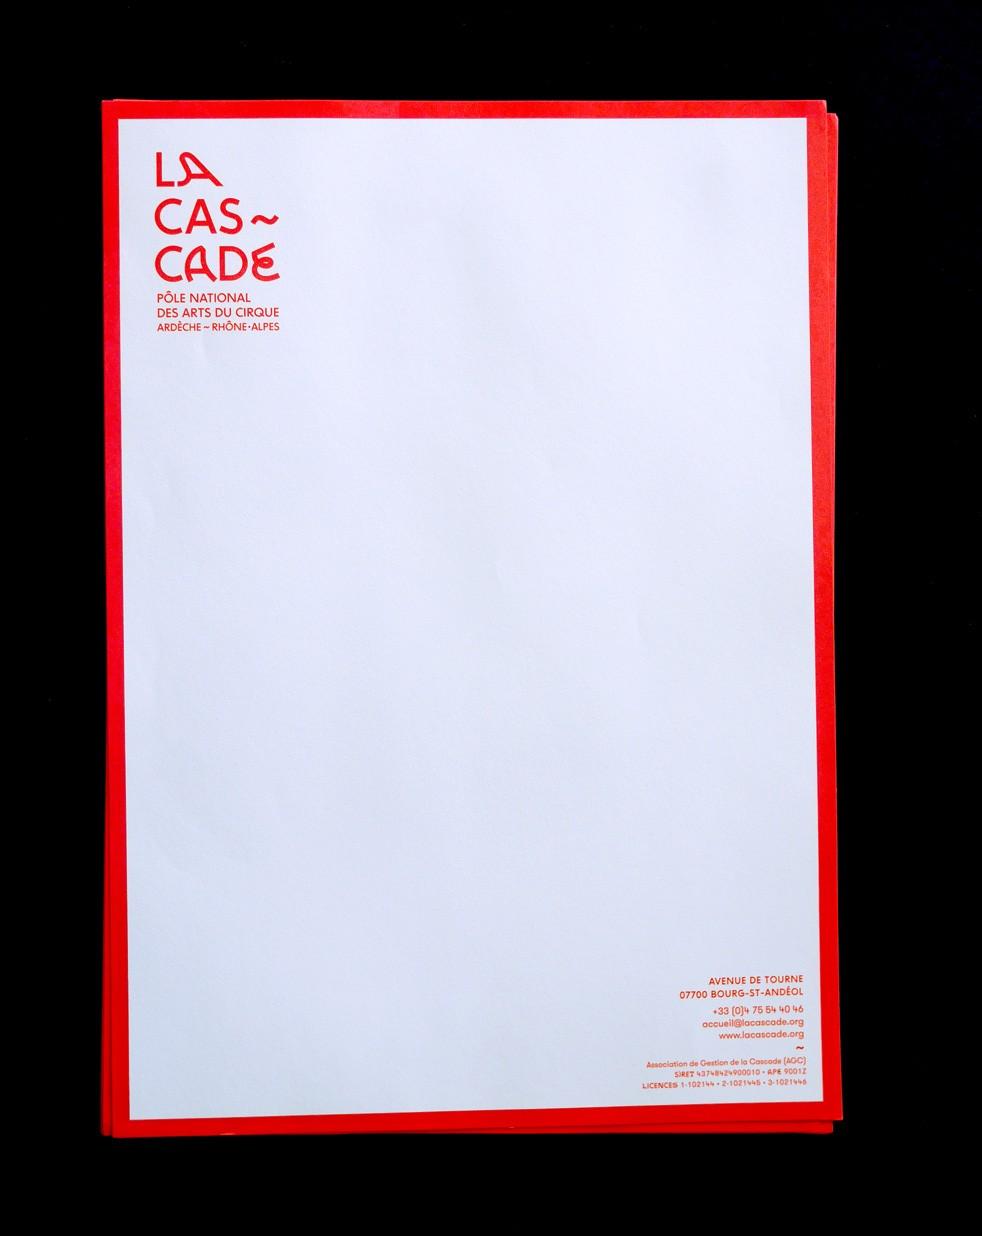 lacascade-papeterie_06-547b28d66c361cd418f29c2bf78e384a